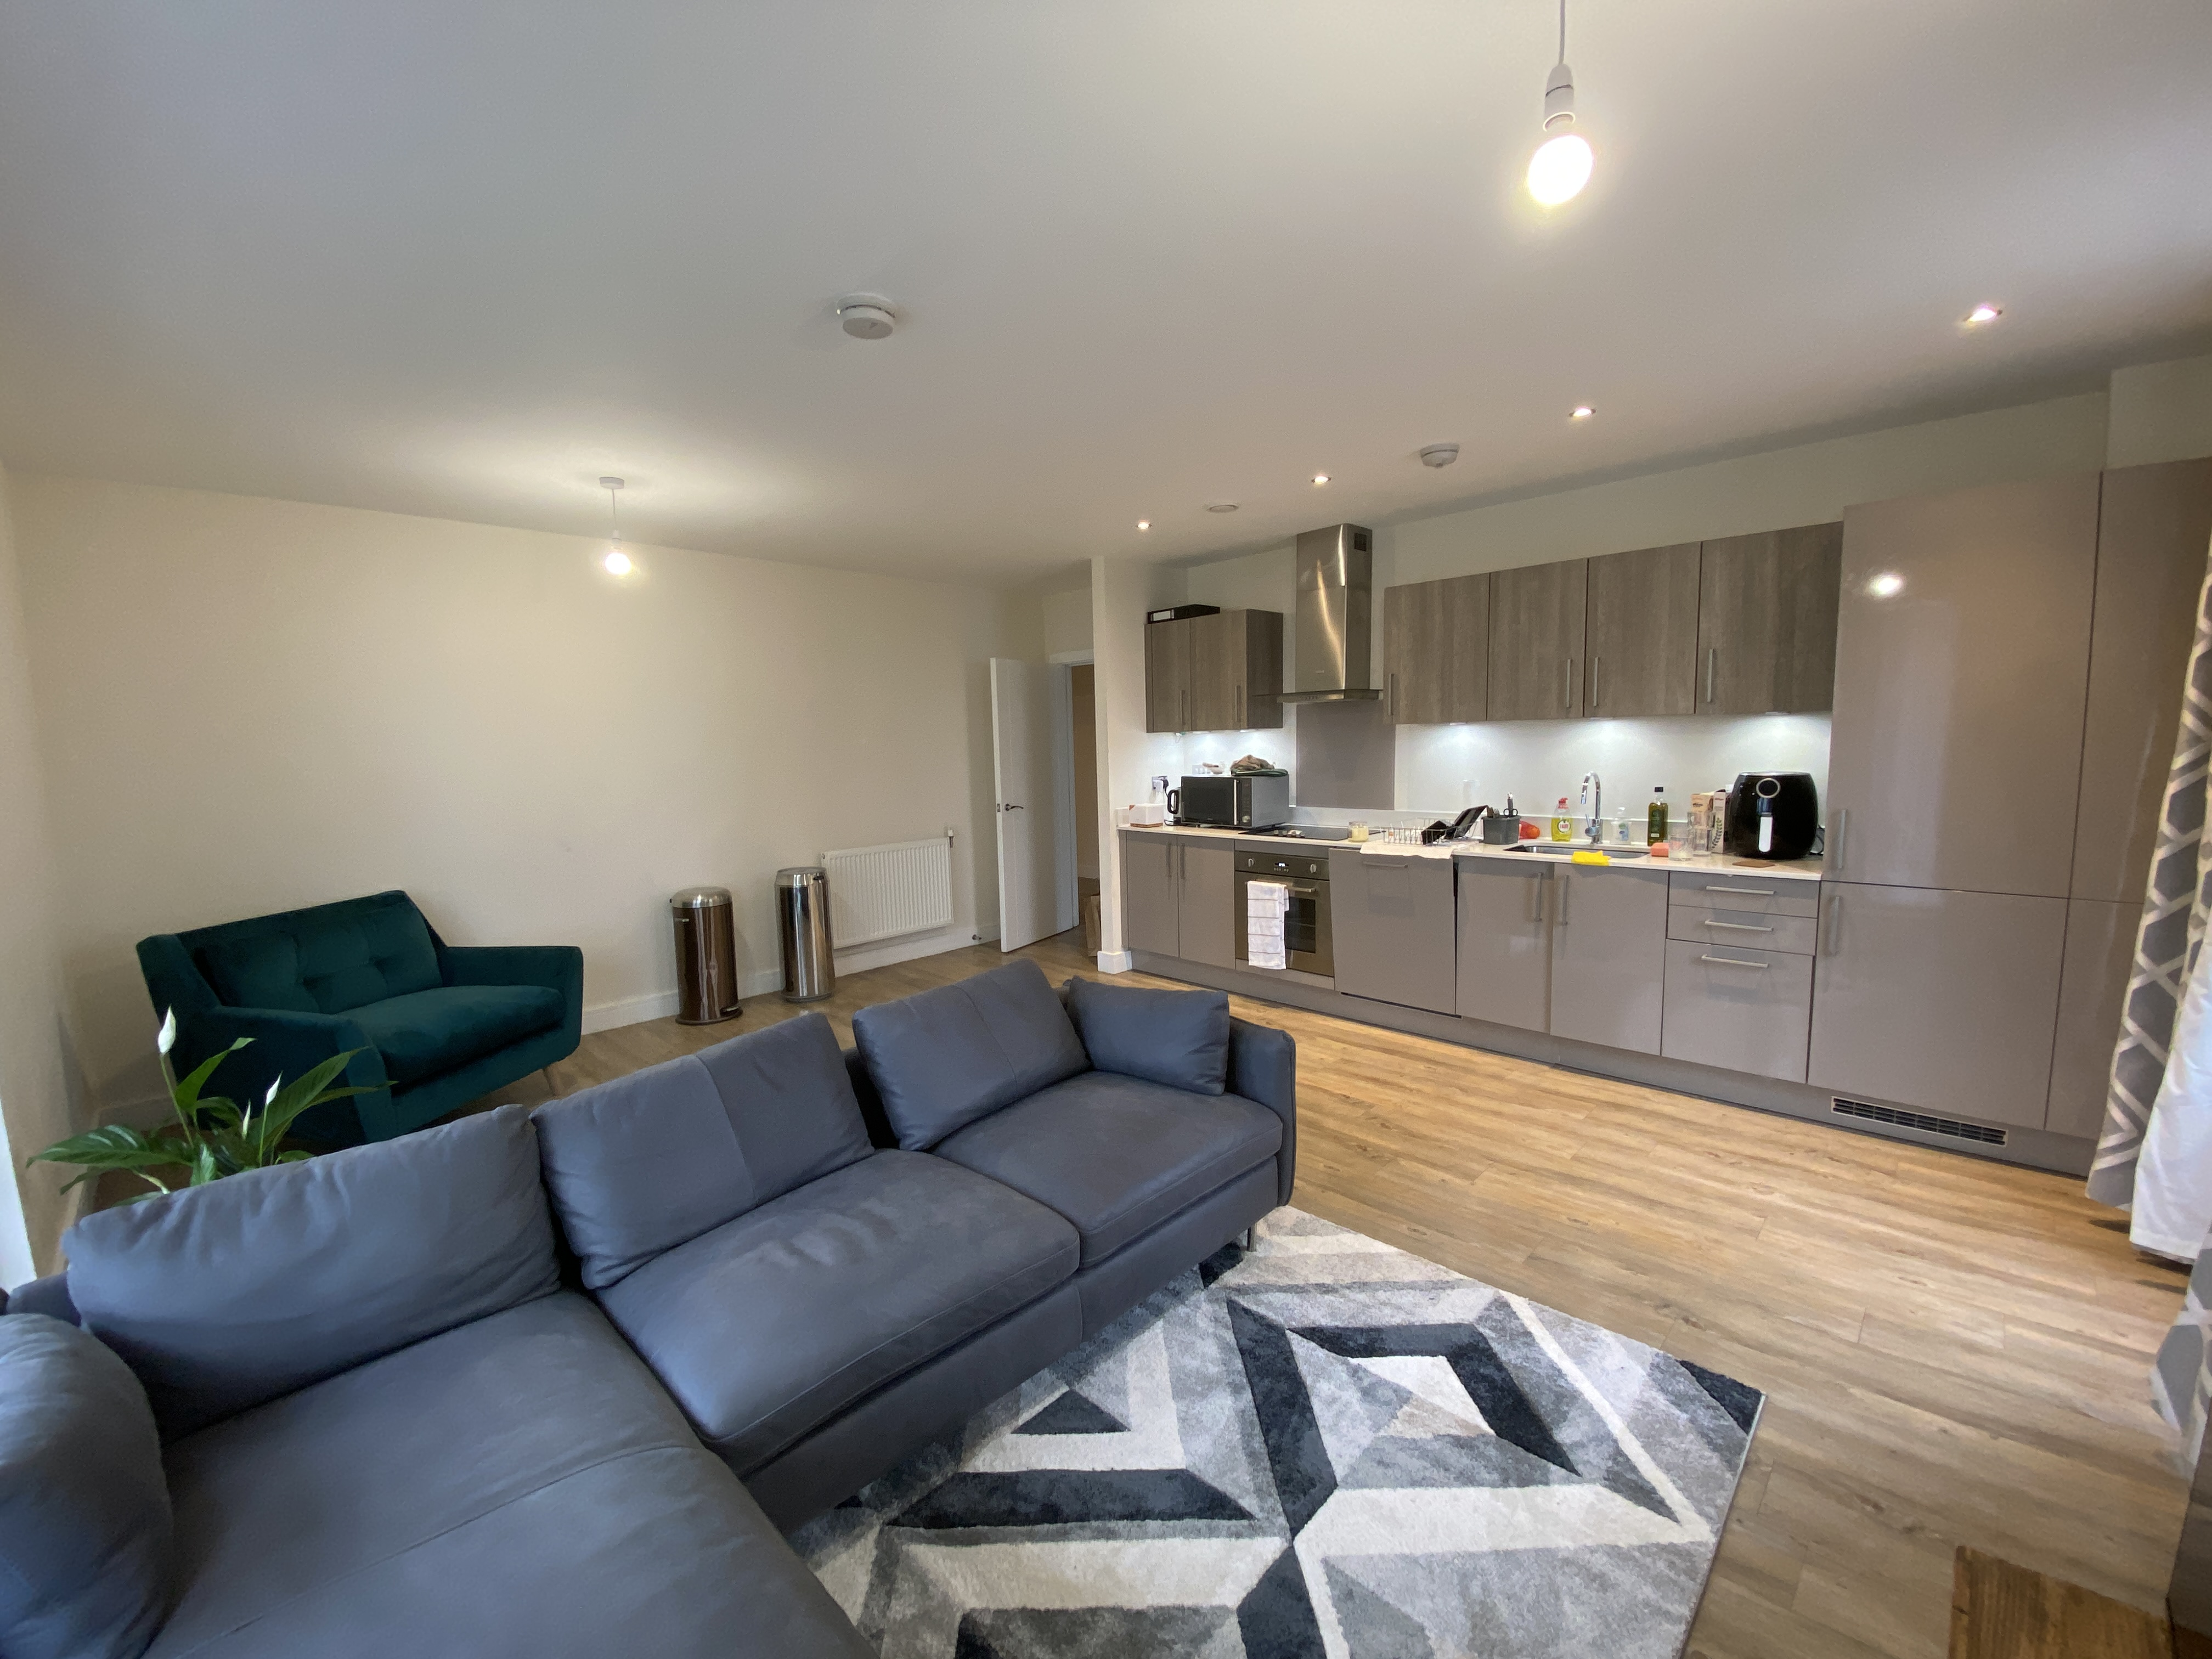 2 bed flat for sale in Pegasus Way, Gillingham, ME7